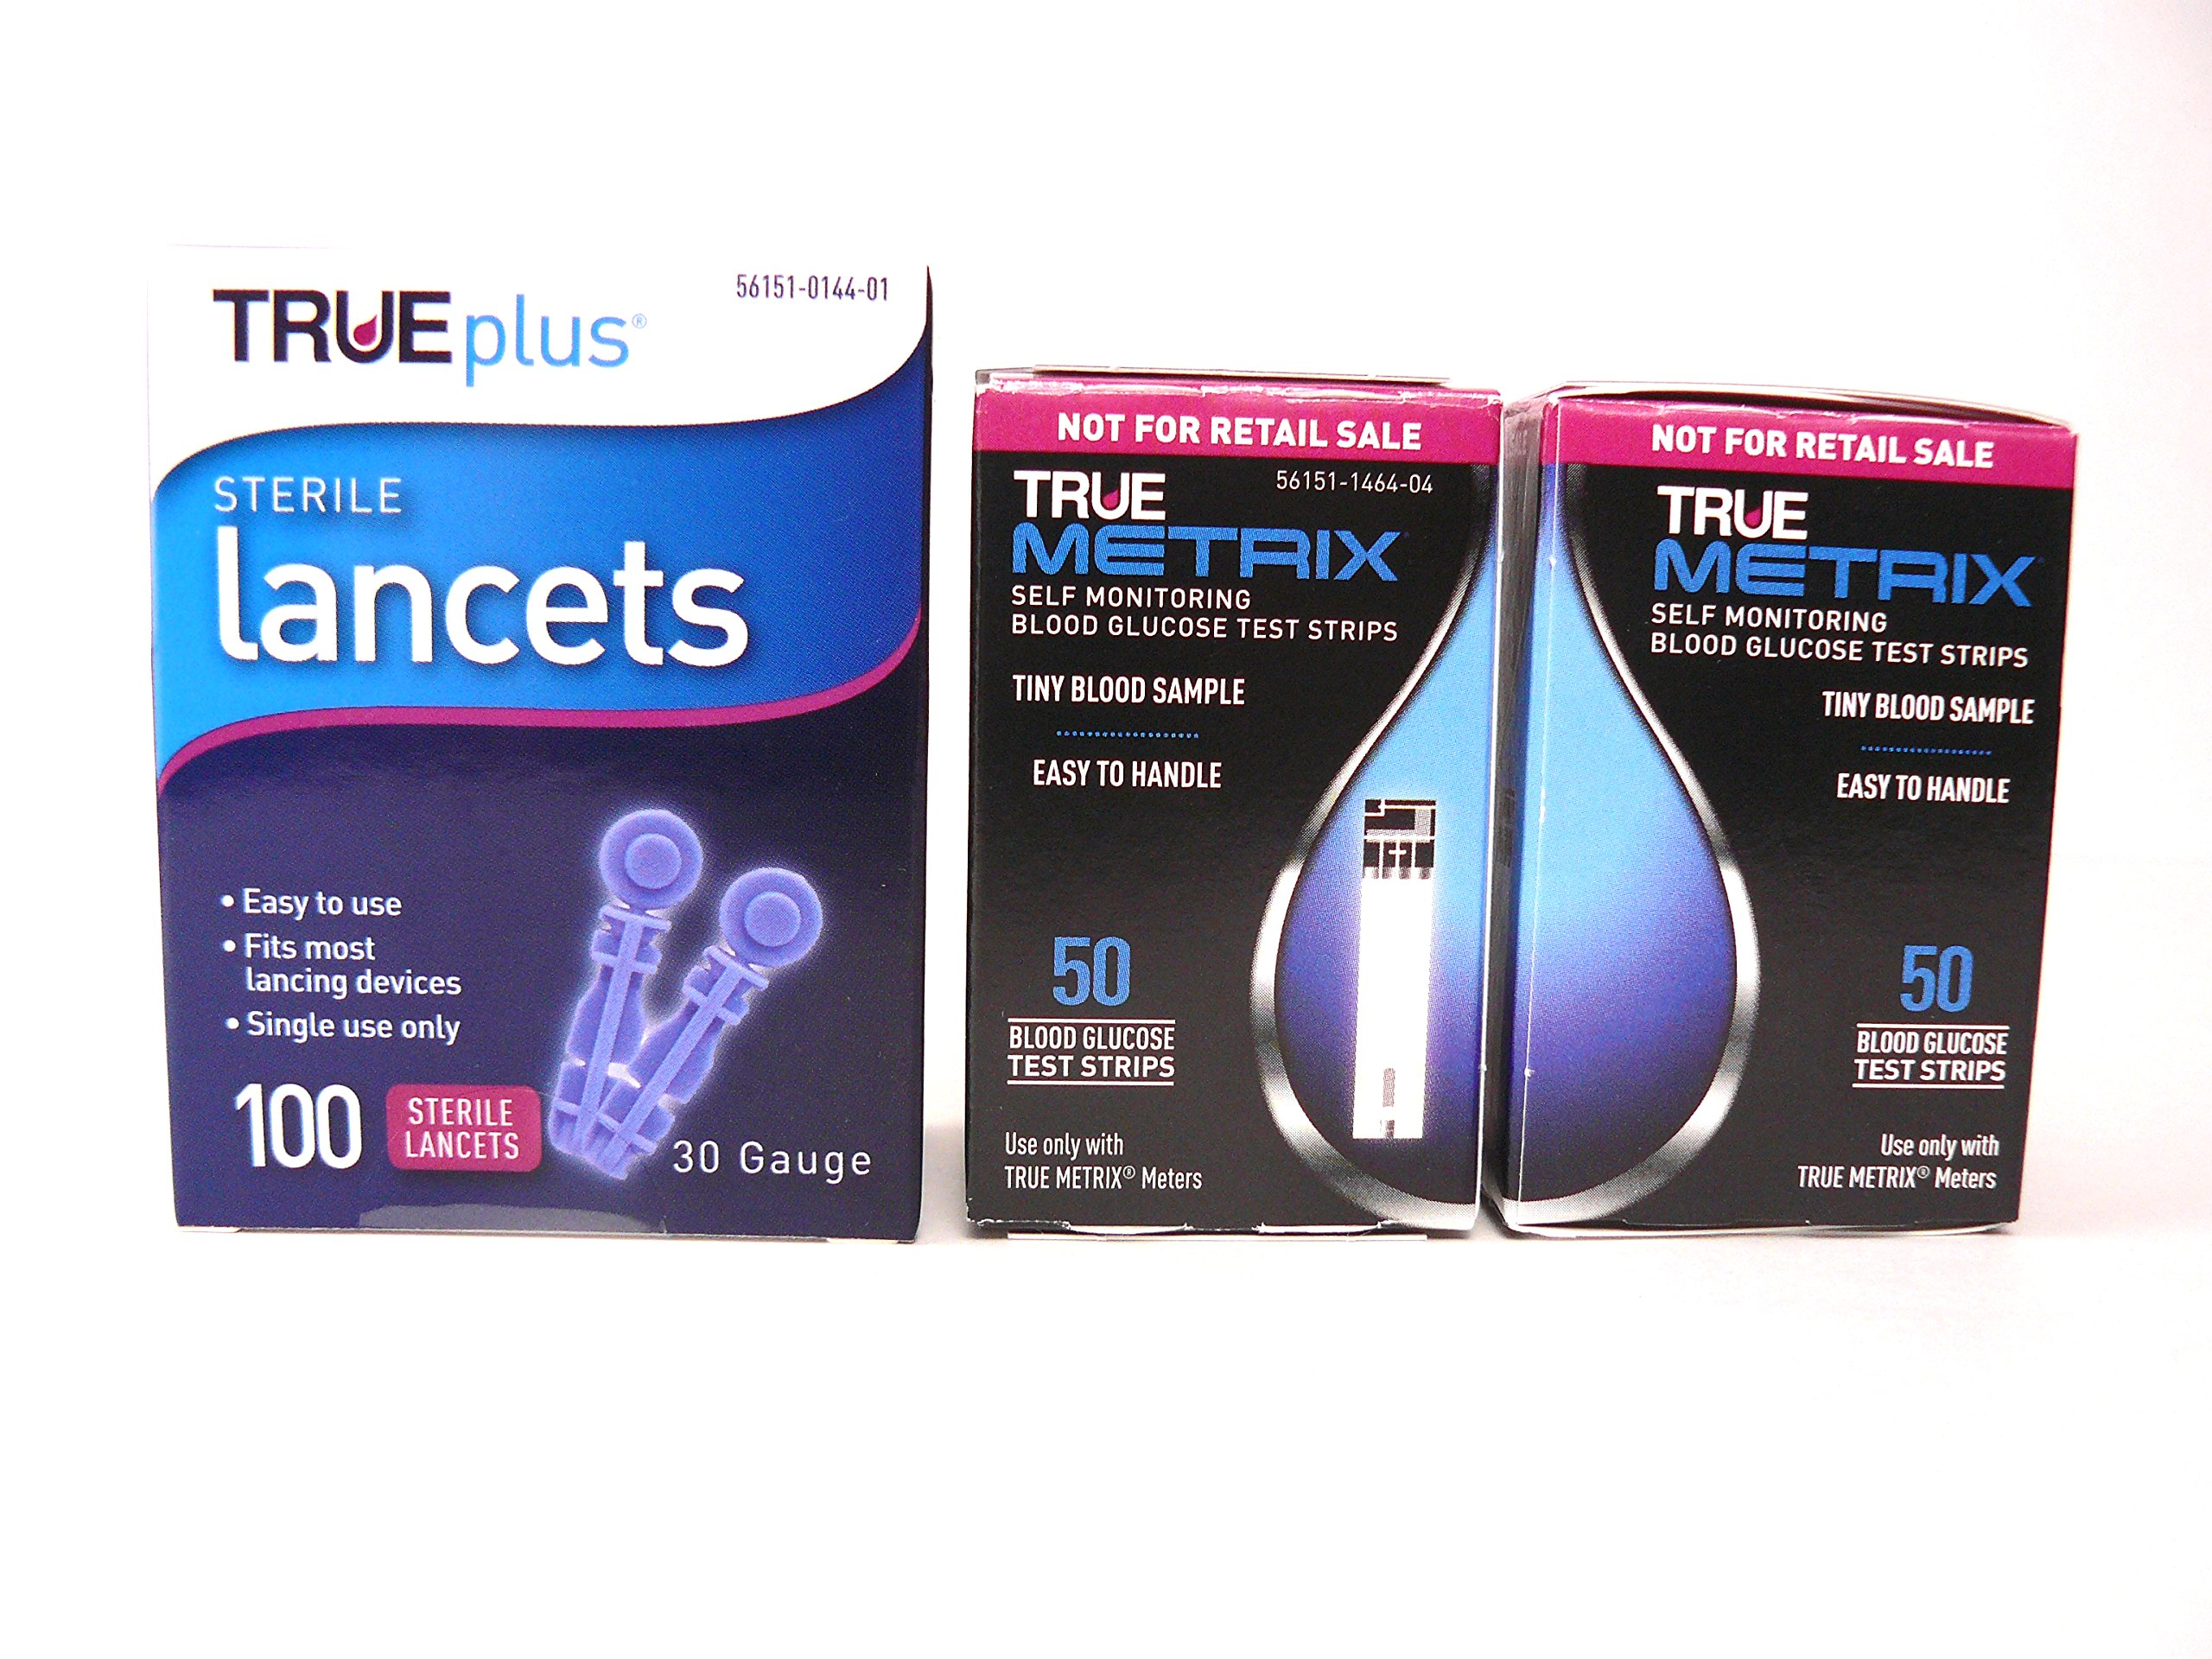 True Metrix Blood Glucose Test Strips 100ct and True Plus 30g Lancets 100ct by TRUE METRIX